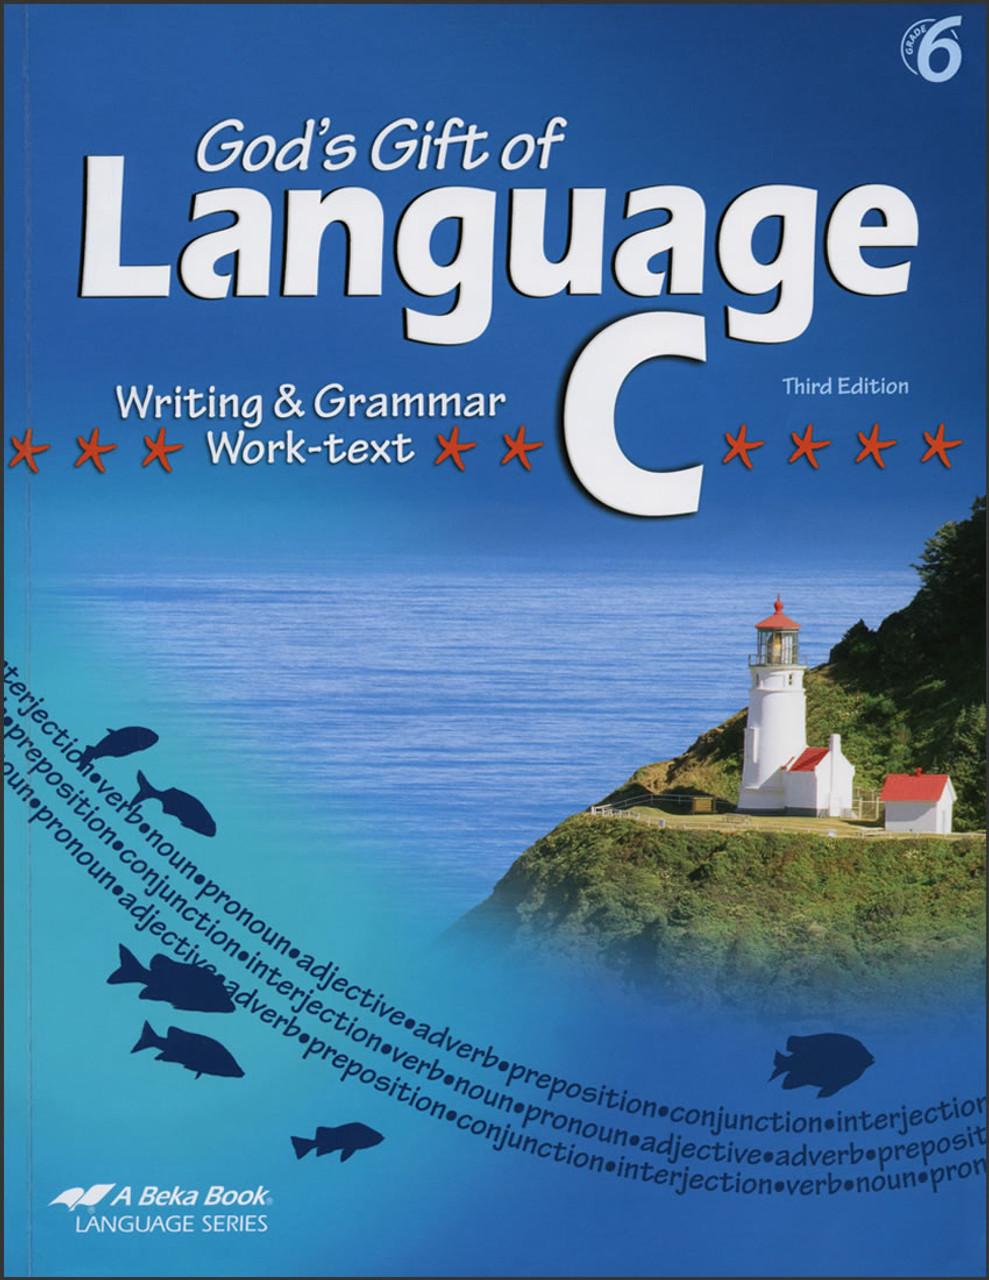 God's Gift of Language C, 3rd edition